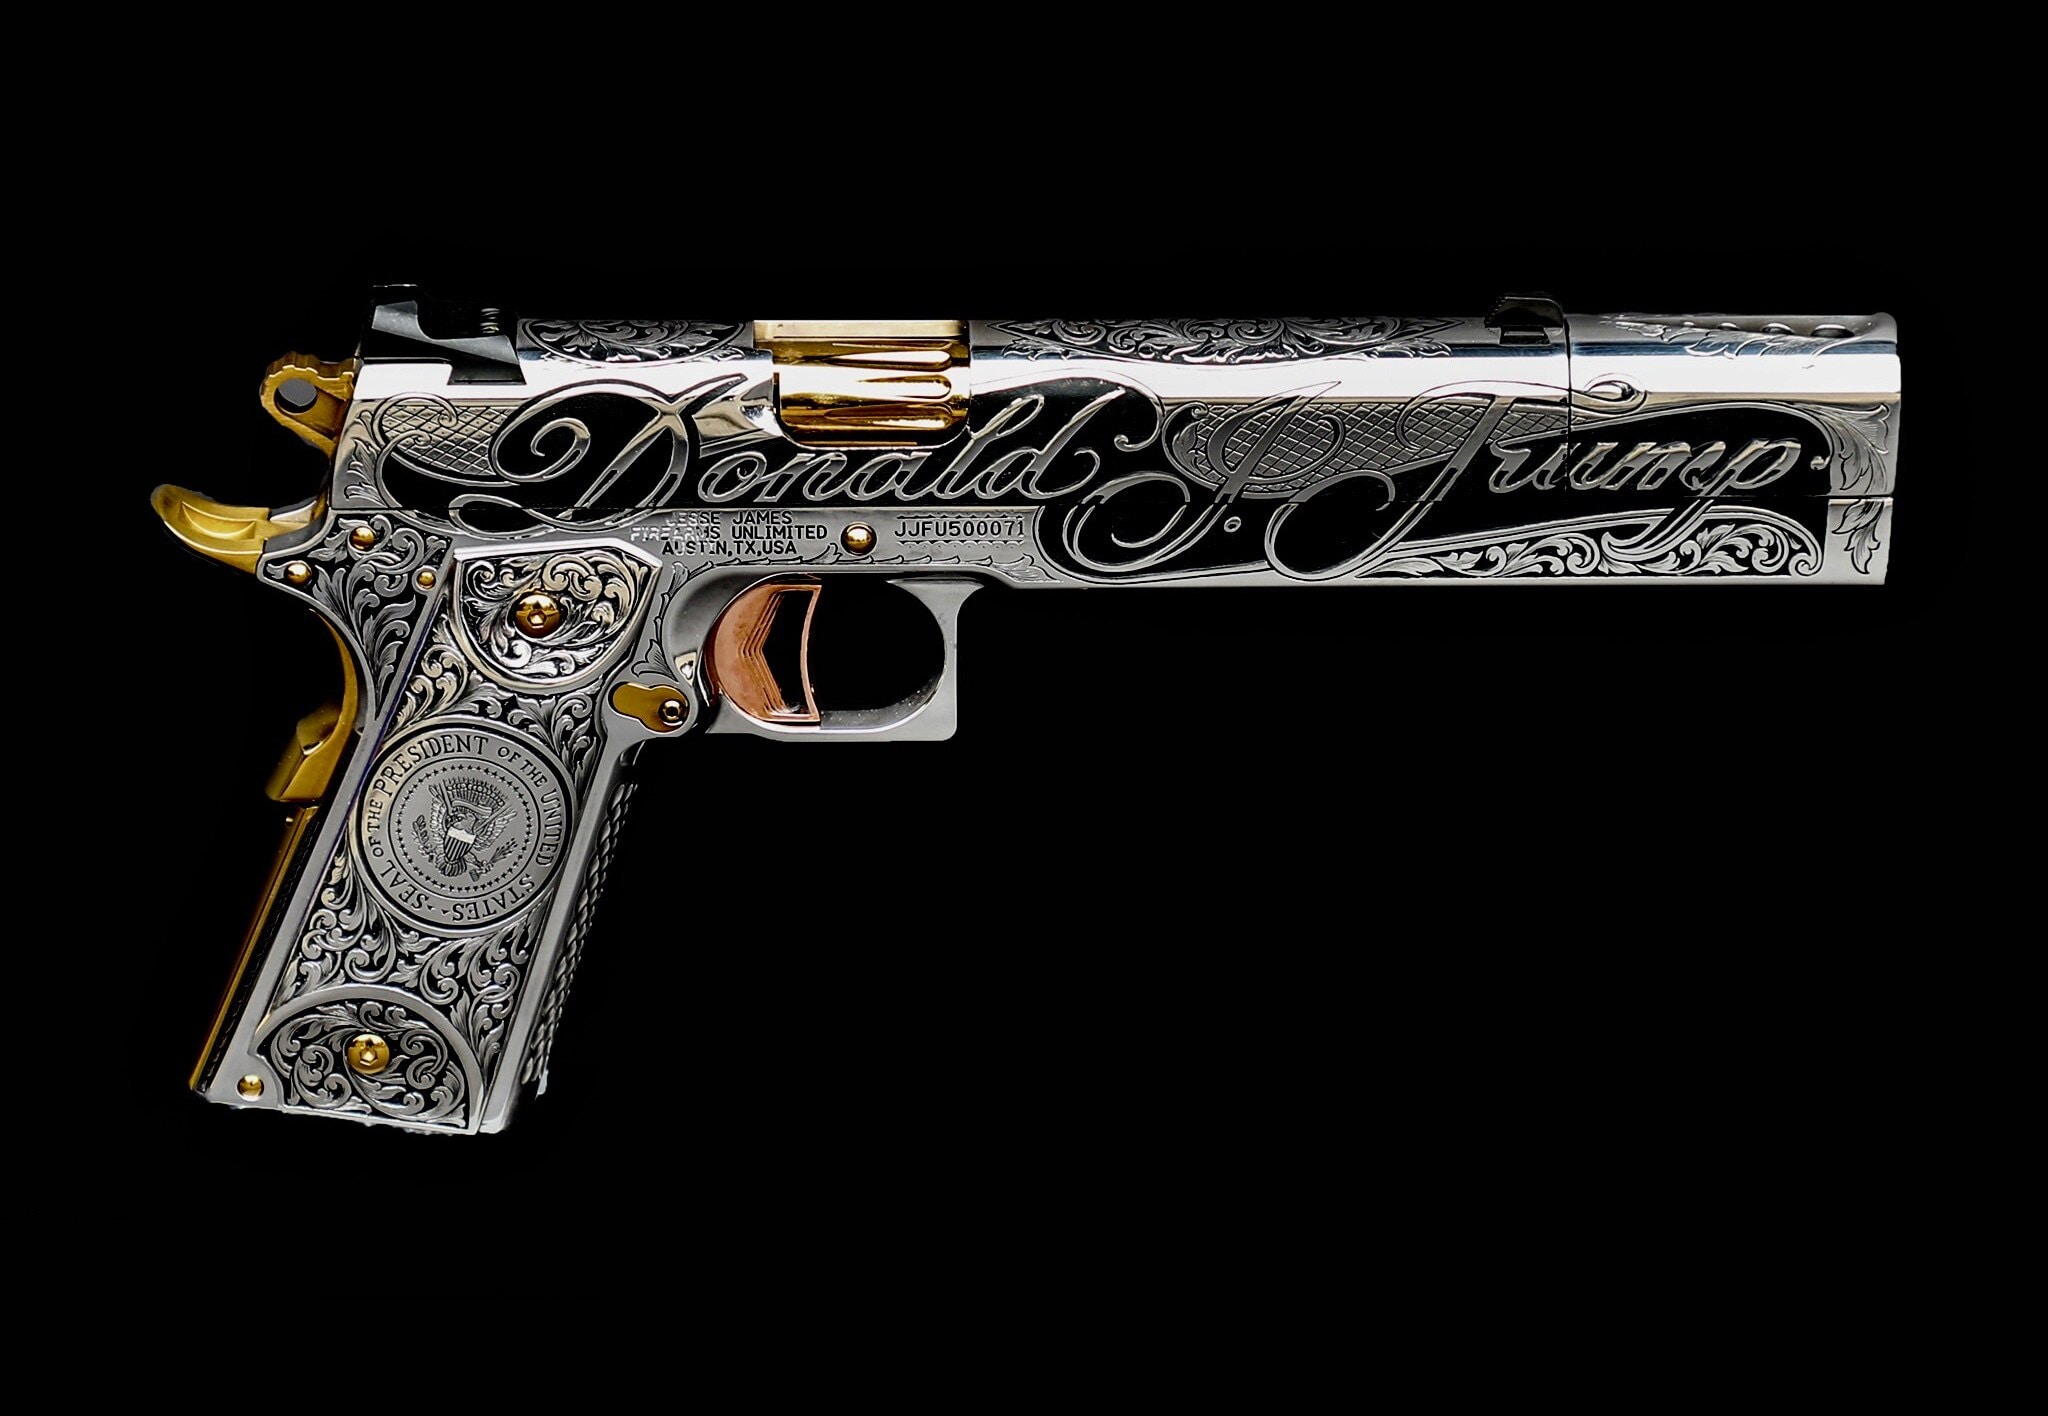 The custom made Trump Gun by Jesse James. (Photo: Jesse James Firearms Unlimited)